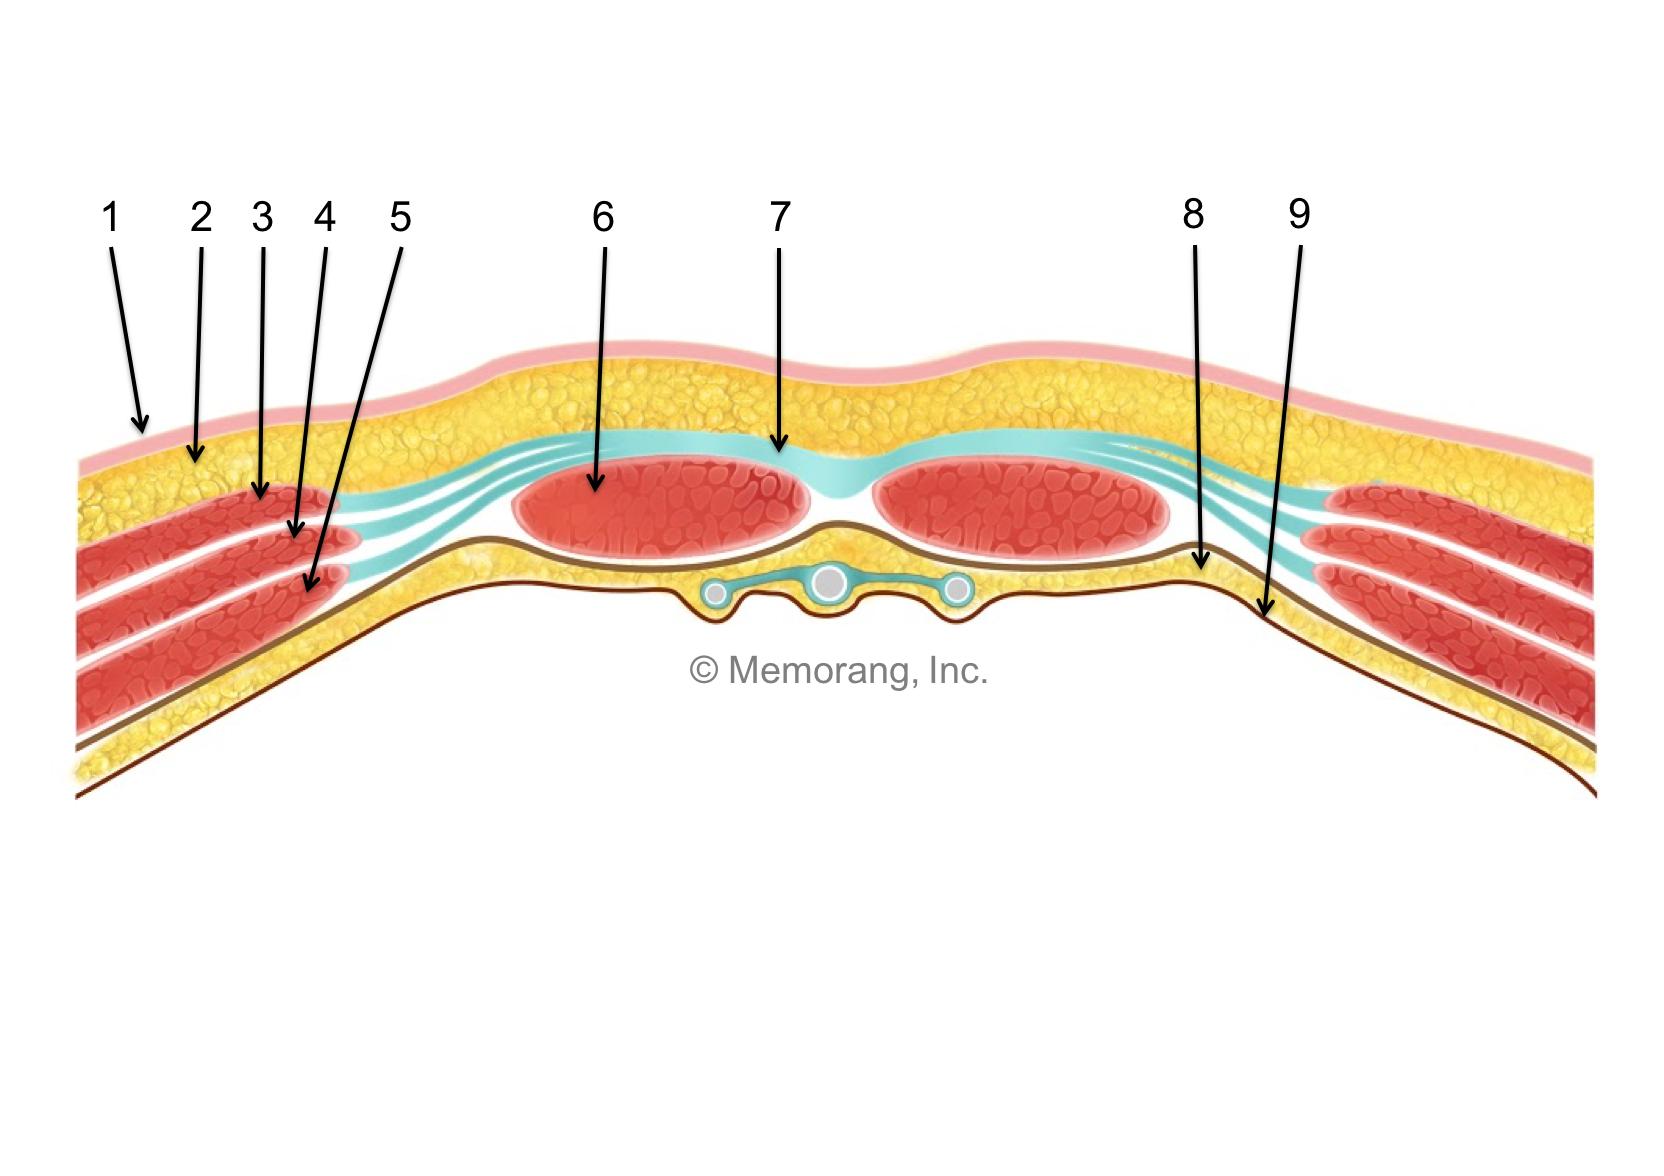 Abdominal Wall Layers (Gastrointestinal Anatomy) Flashcards | Memorang